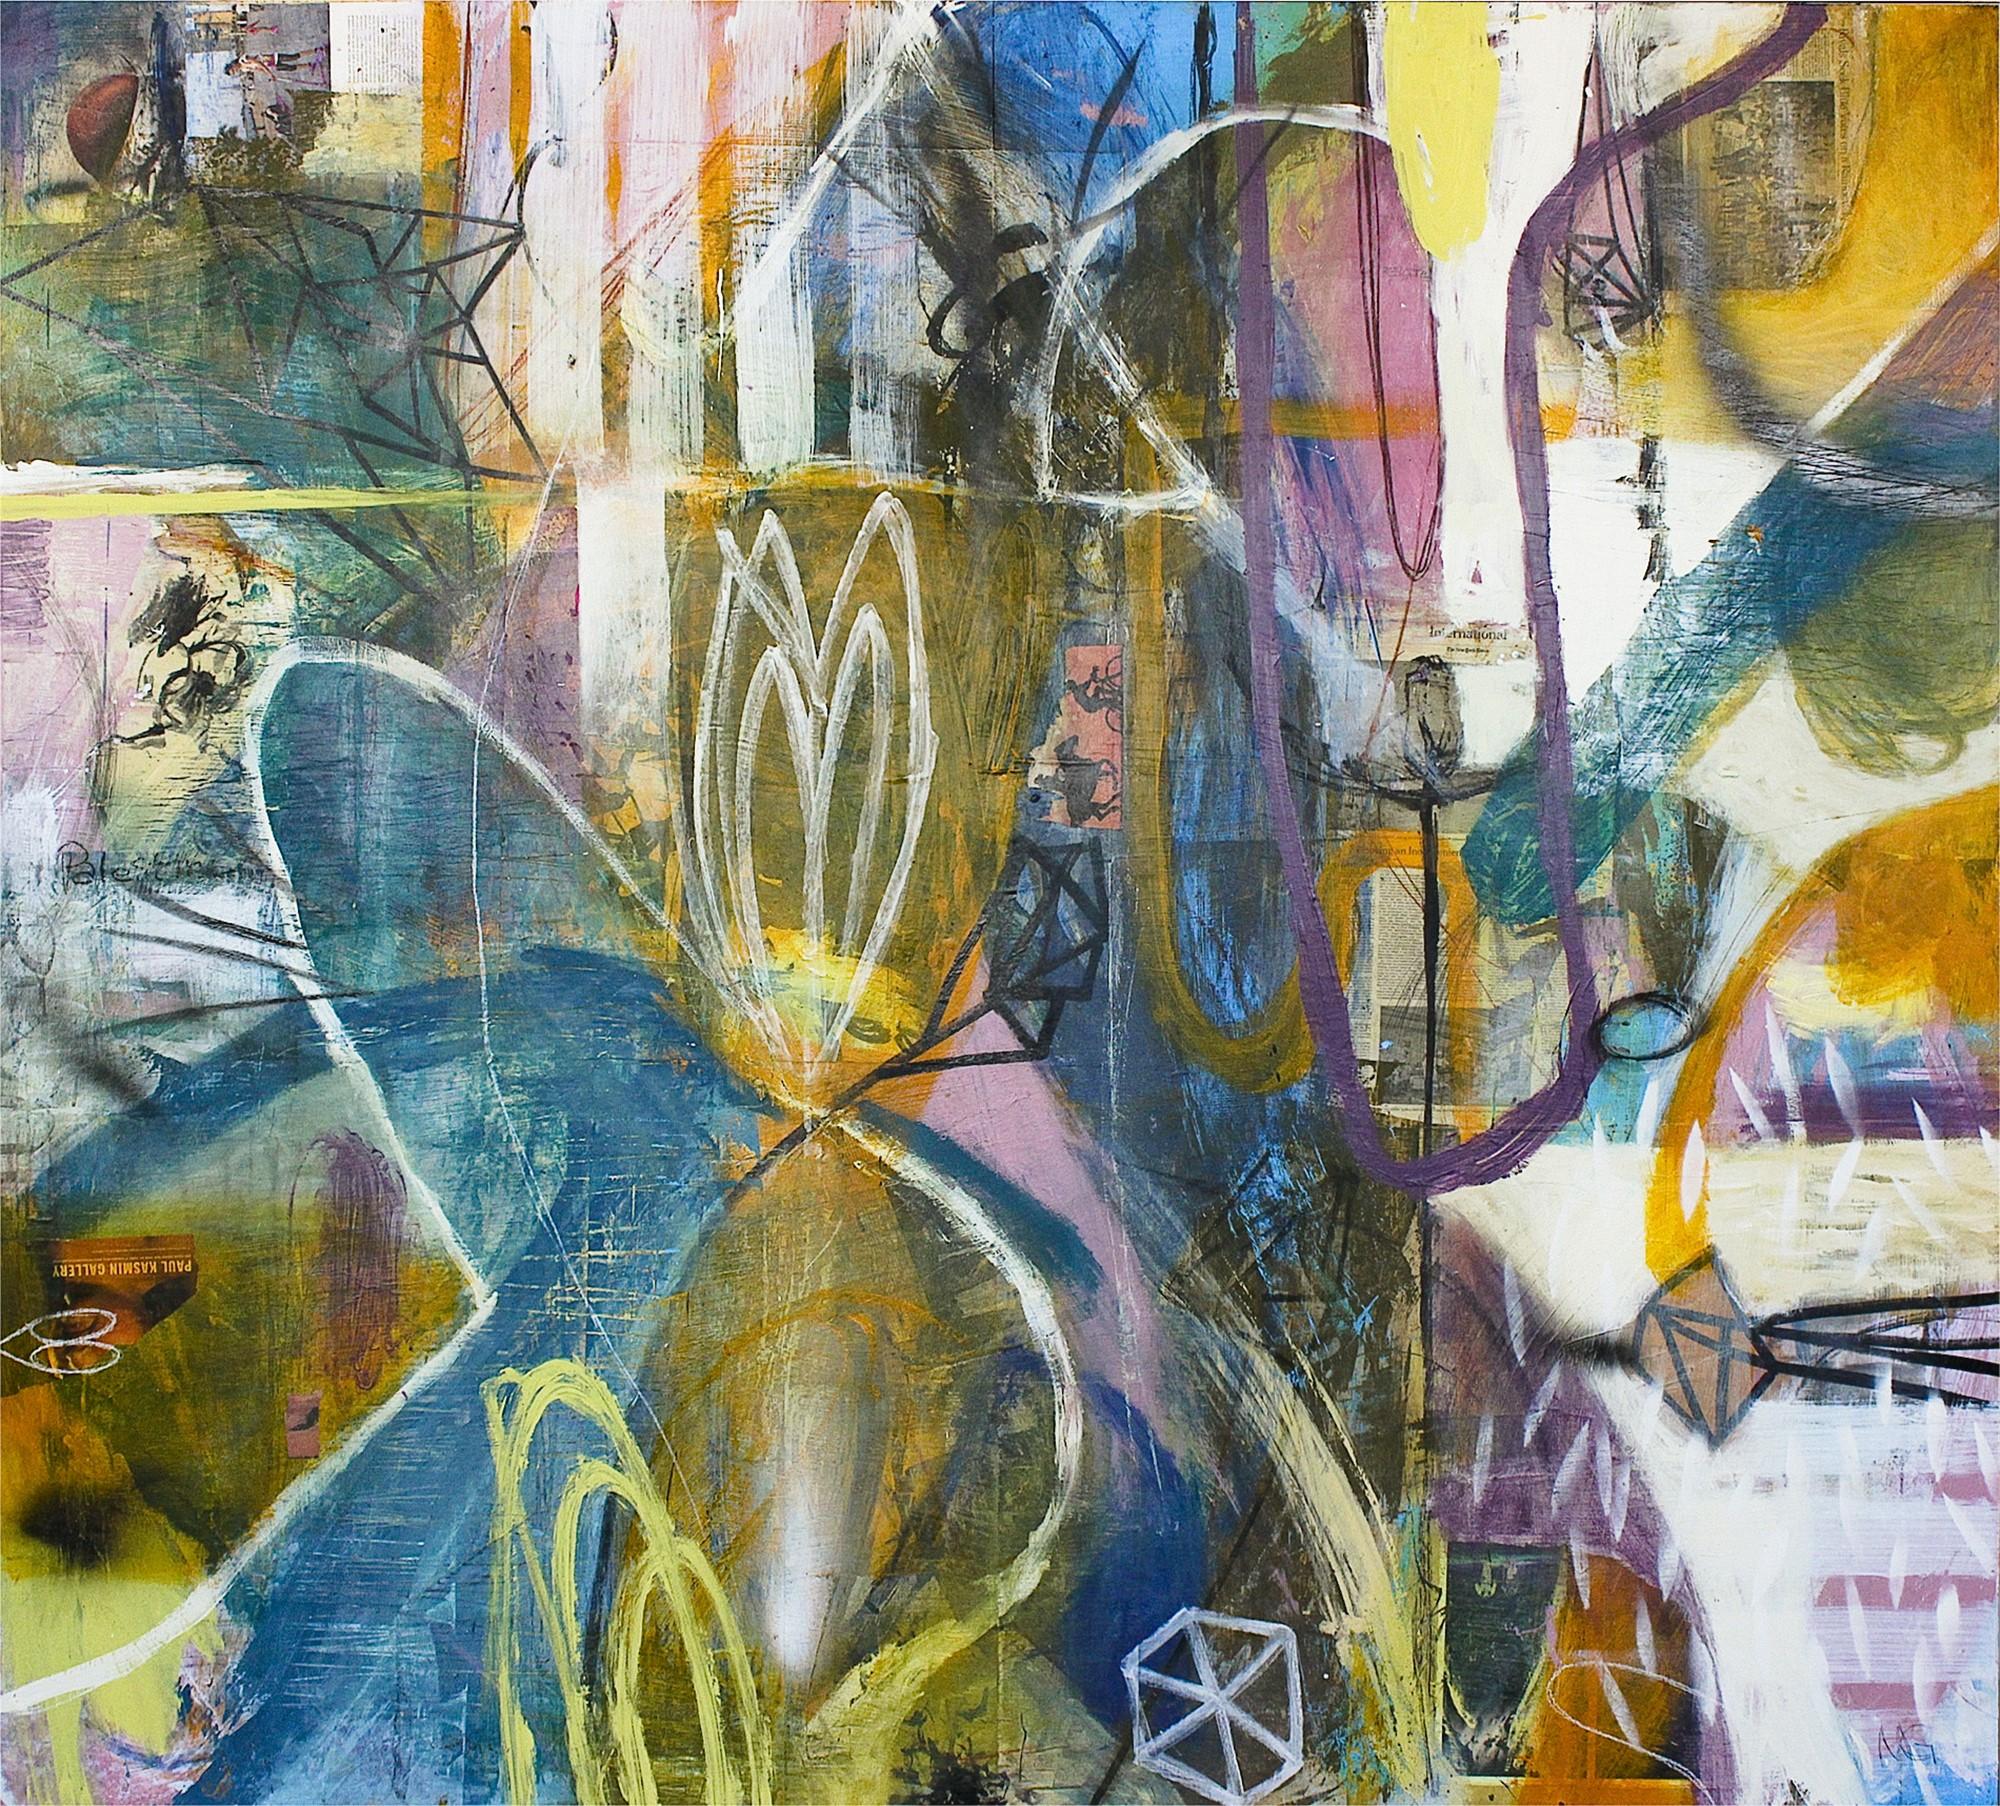 Gallop by Michael Gadlin